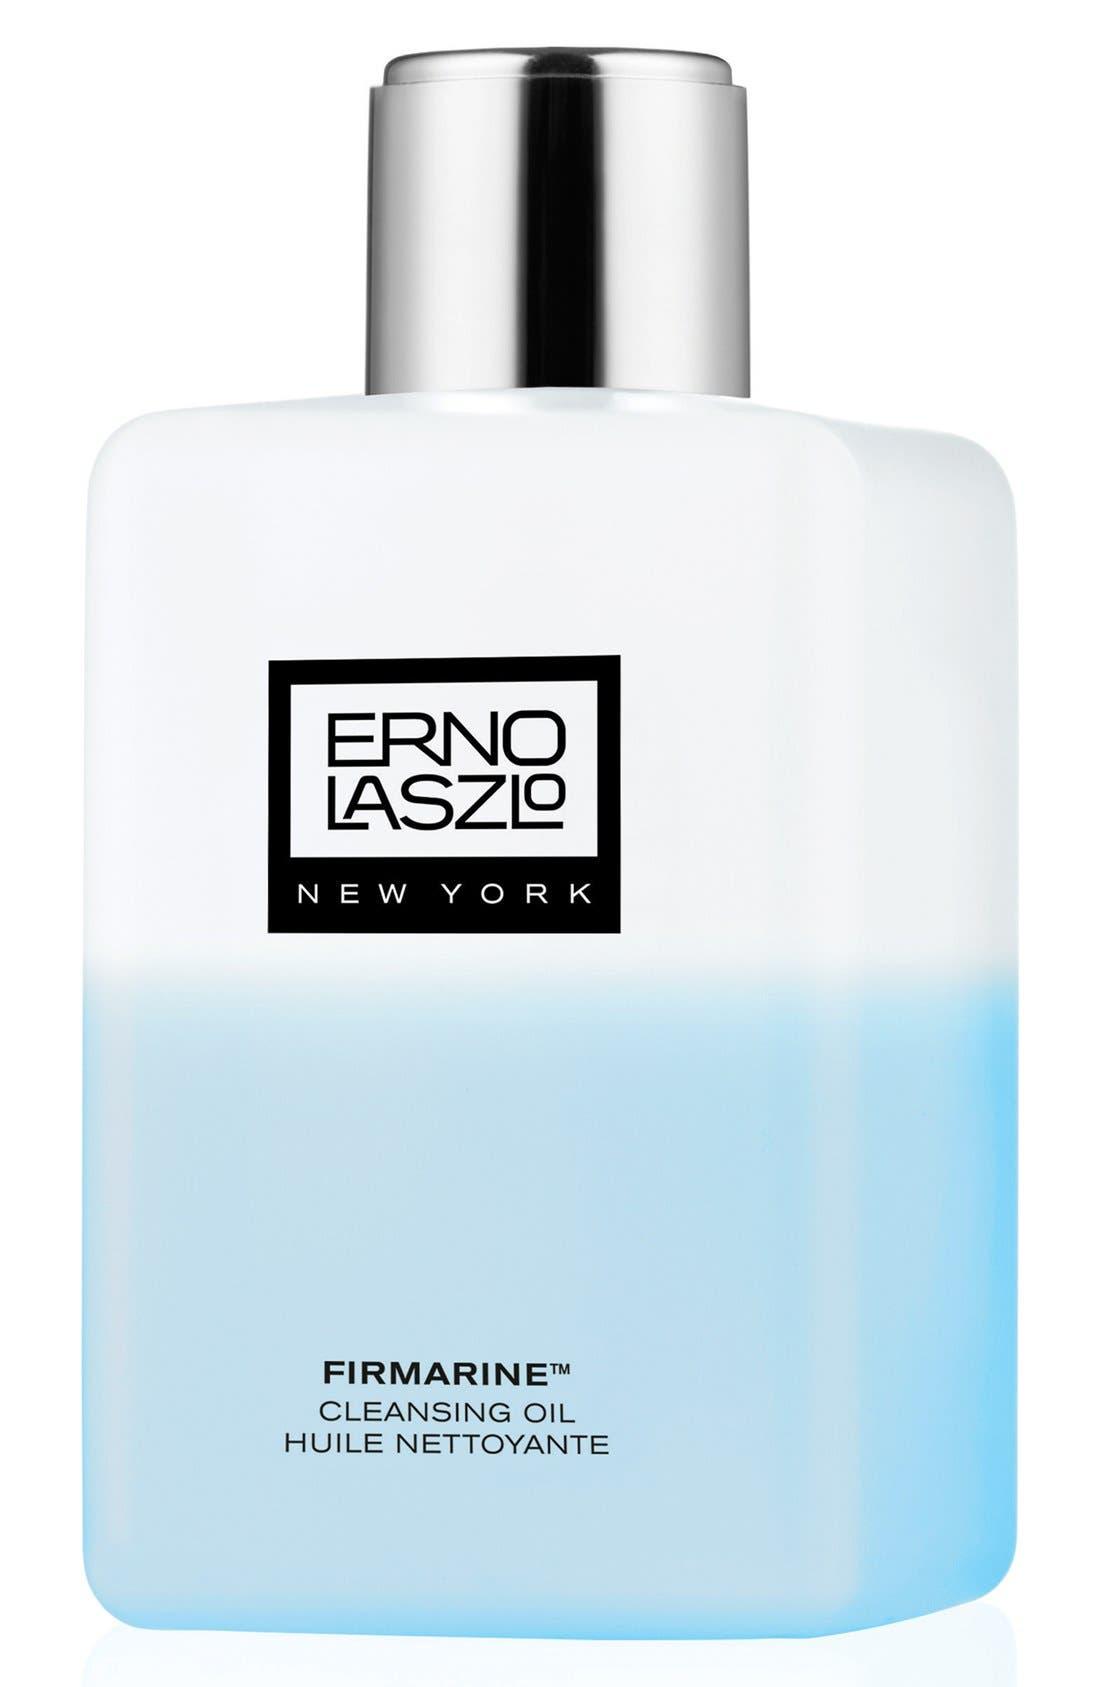 Erno Laszlo 'Firmarine' Cleansing Oil